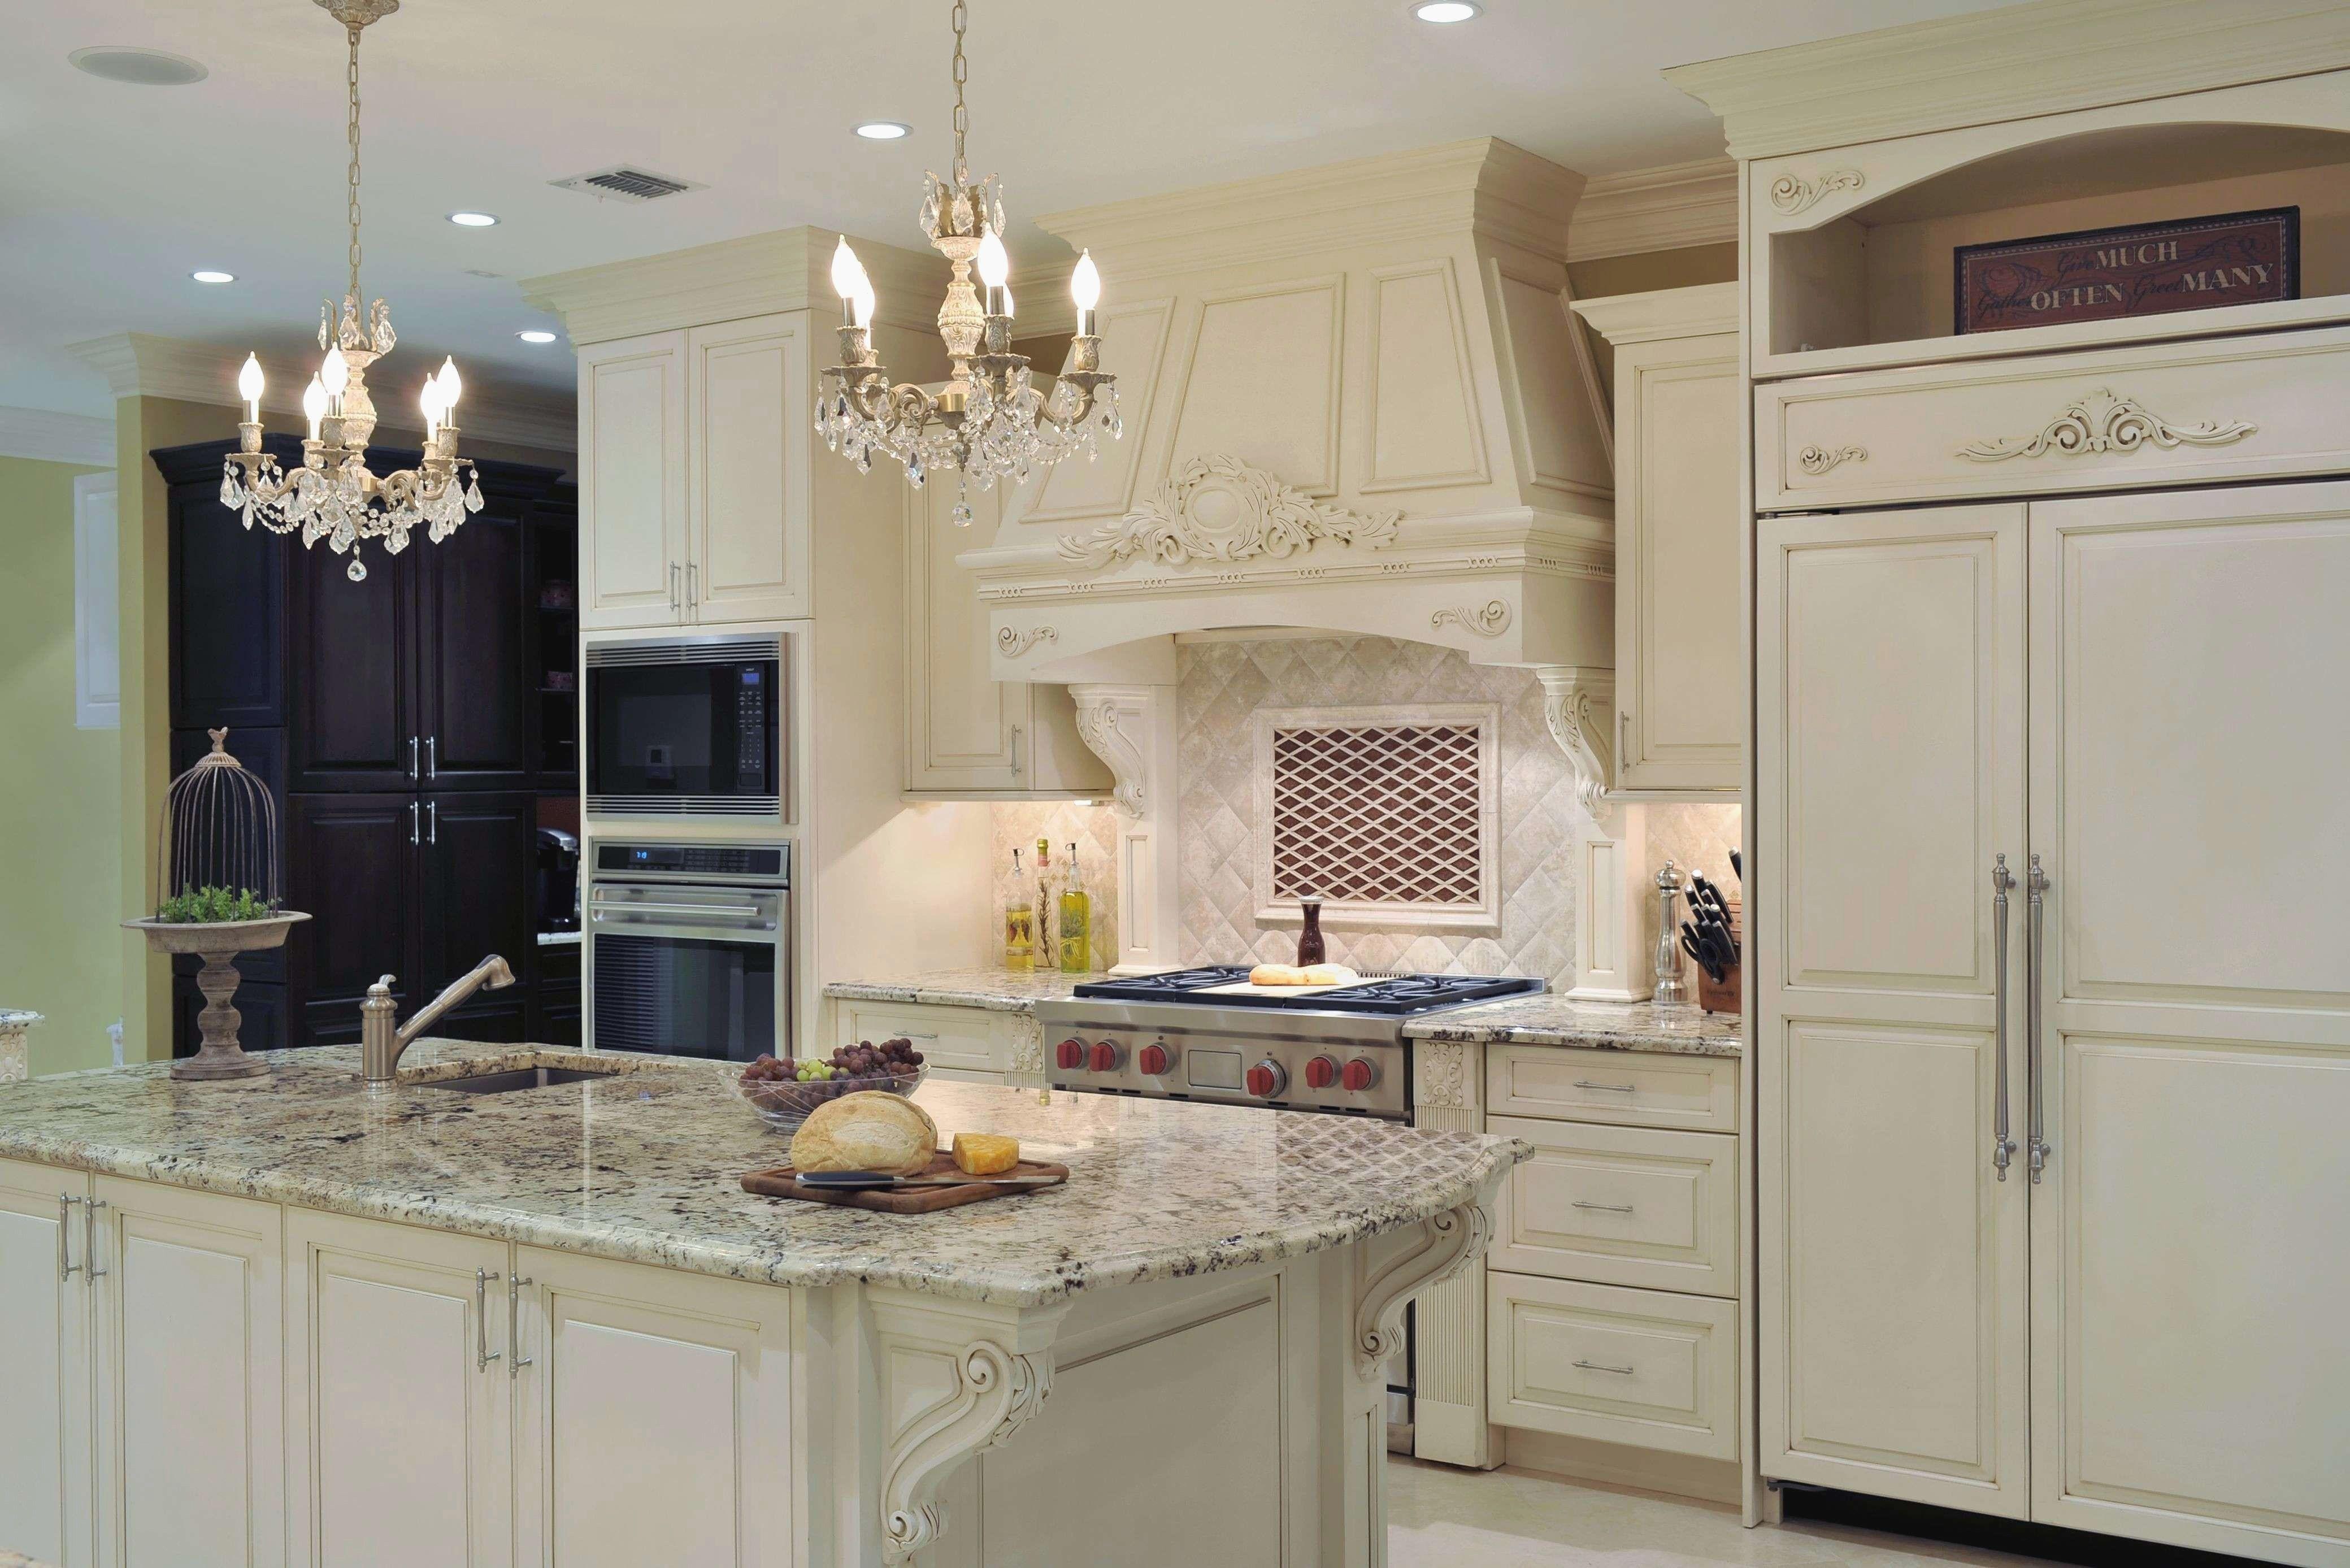 Inspirational Kitchen Cabinets Dallas The Most Awesome And Also Gorgeous Kitchen Cabinets Dallas Regarding Really Enc Desain Dapur Dapur Cantik Dapur Modern